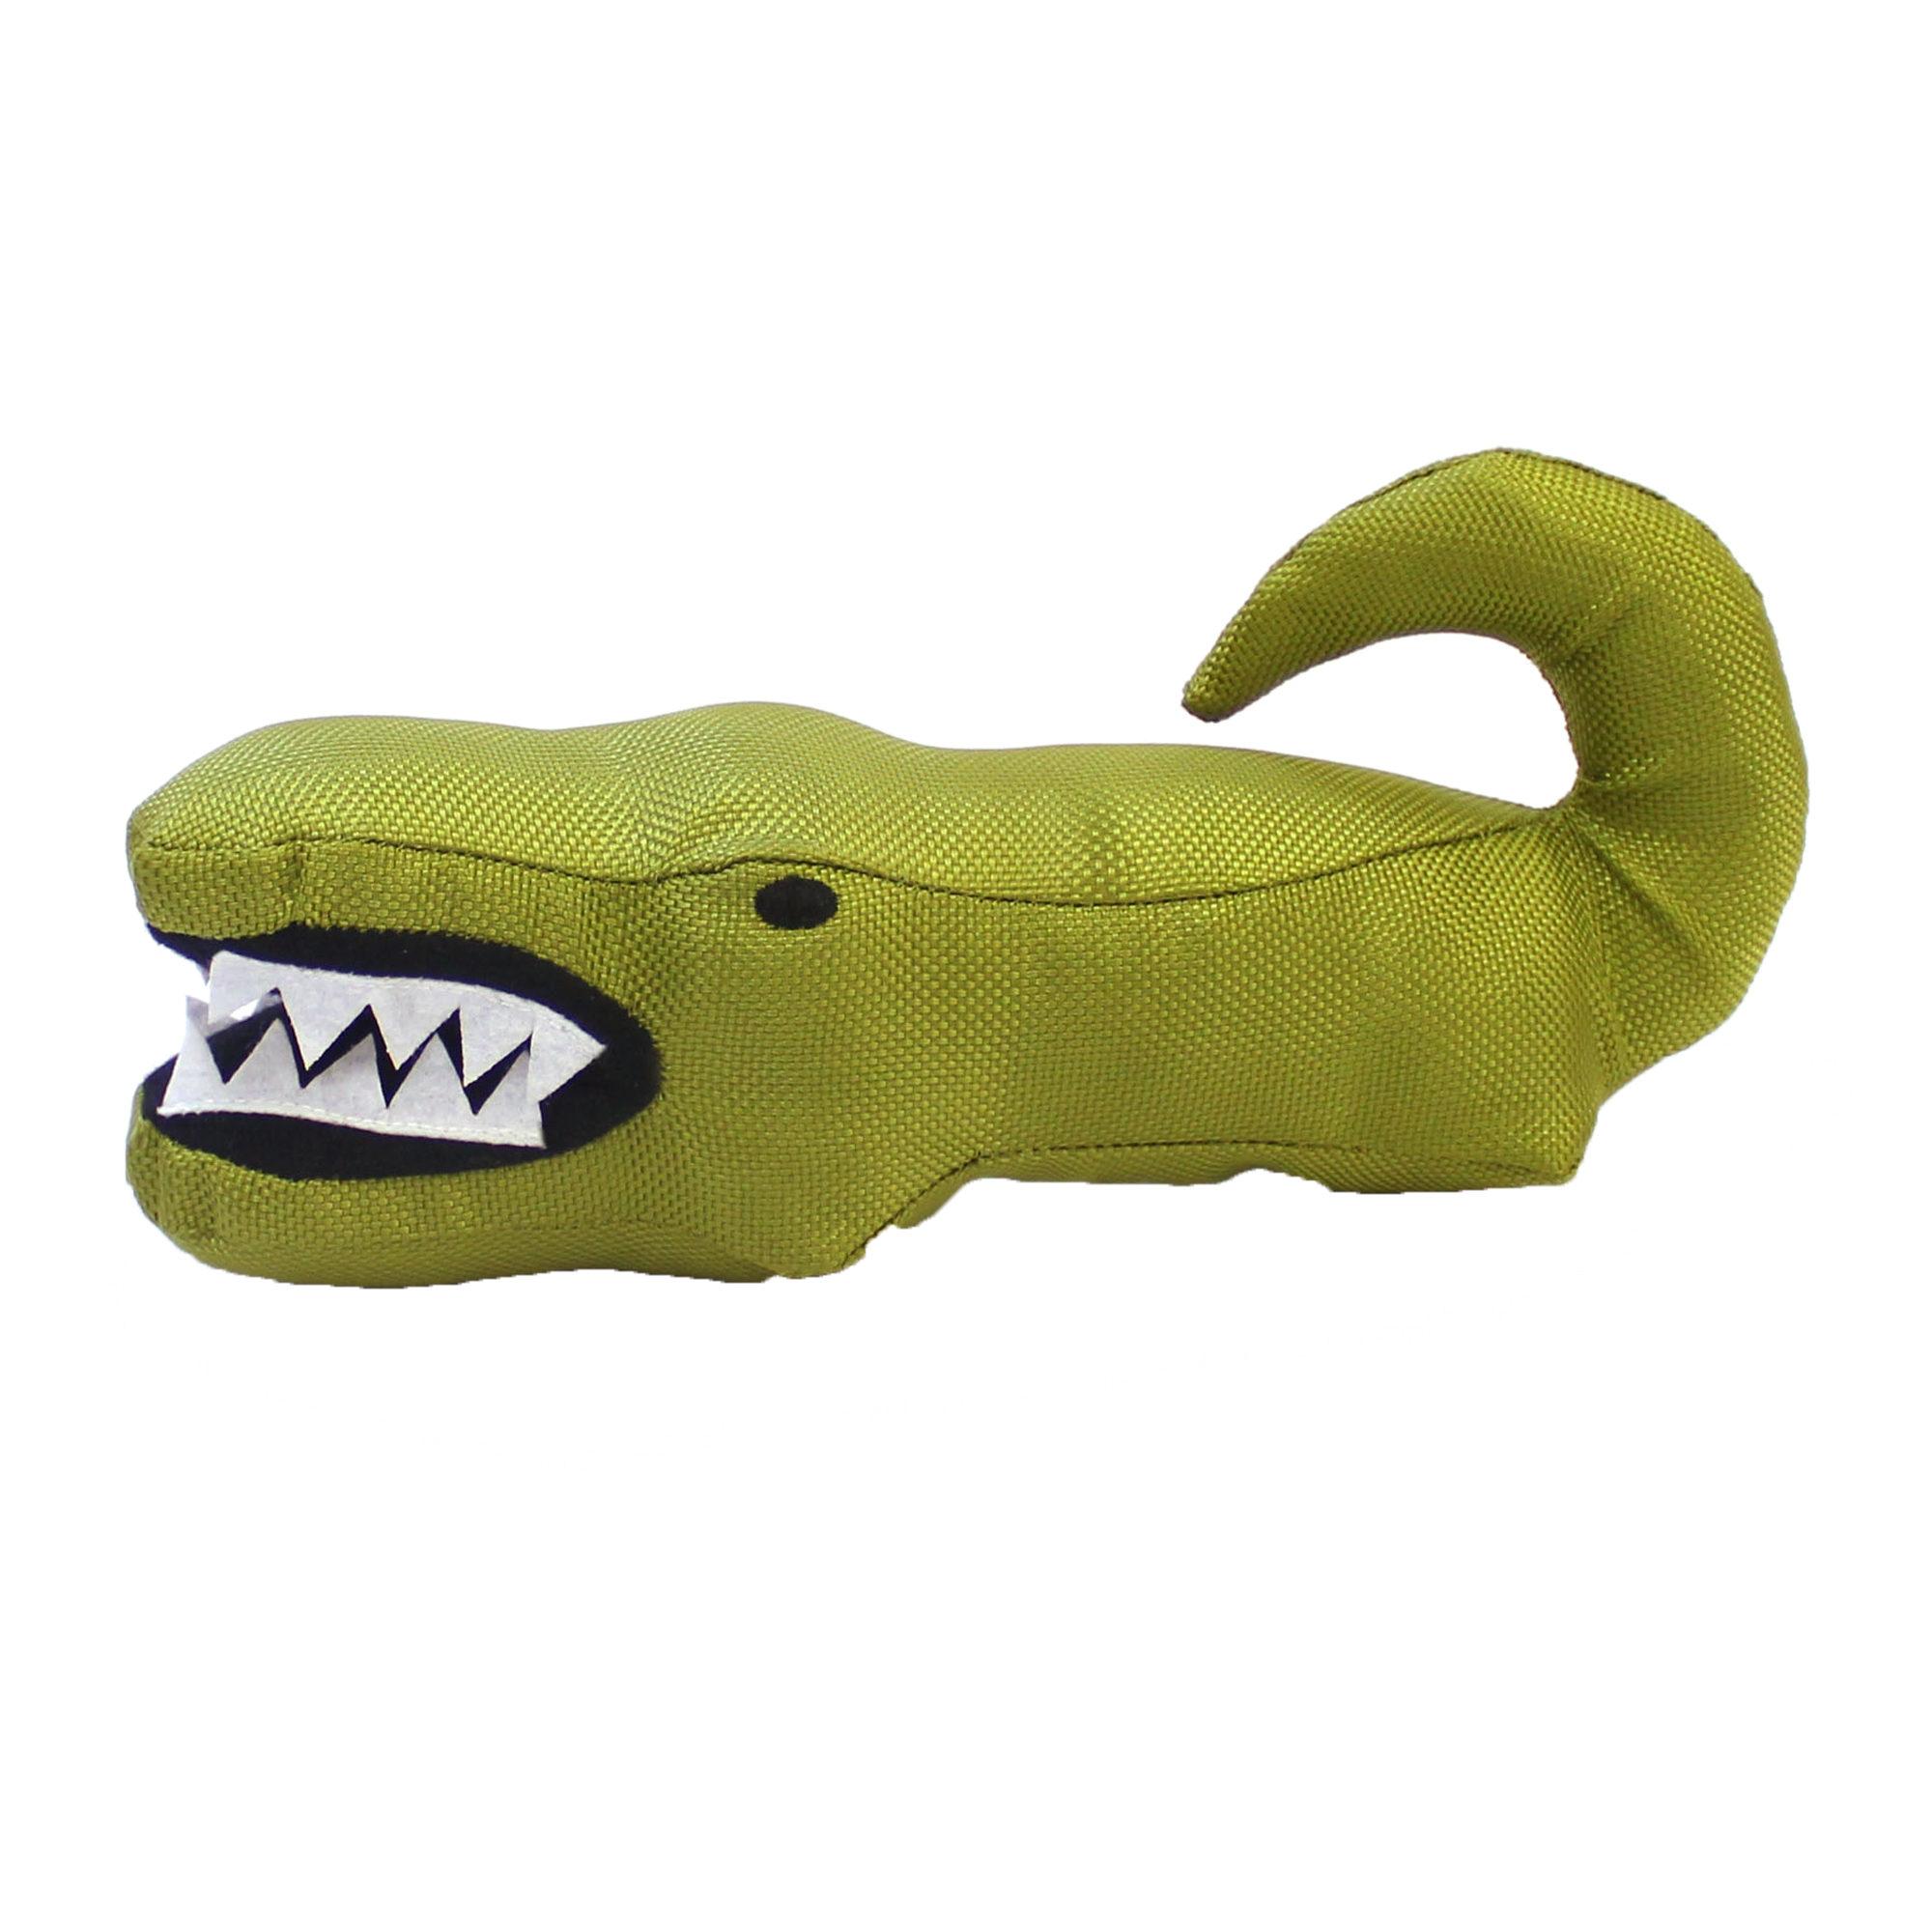 Beco Cuddly Soft Toy Aretha the Alligator